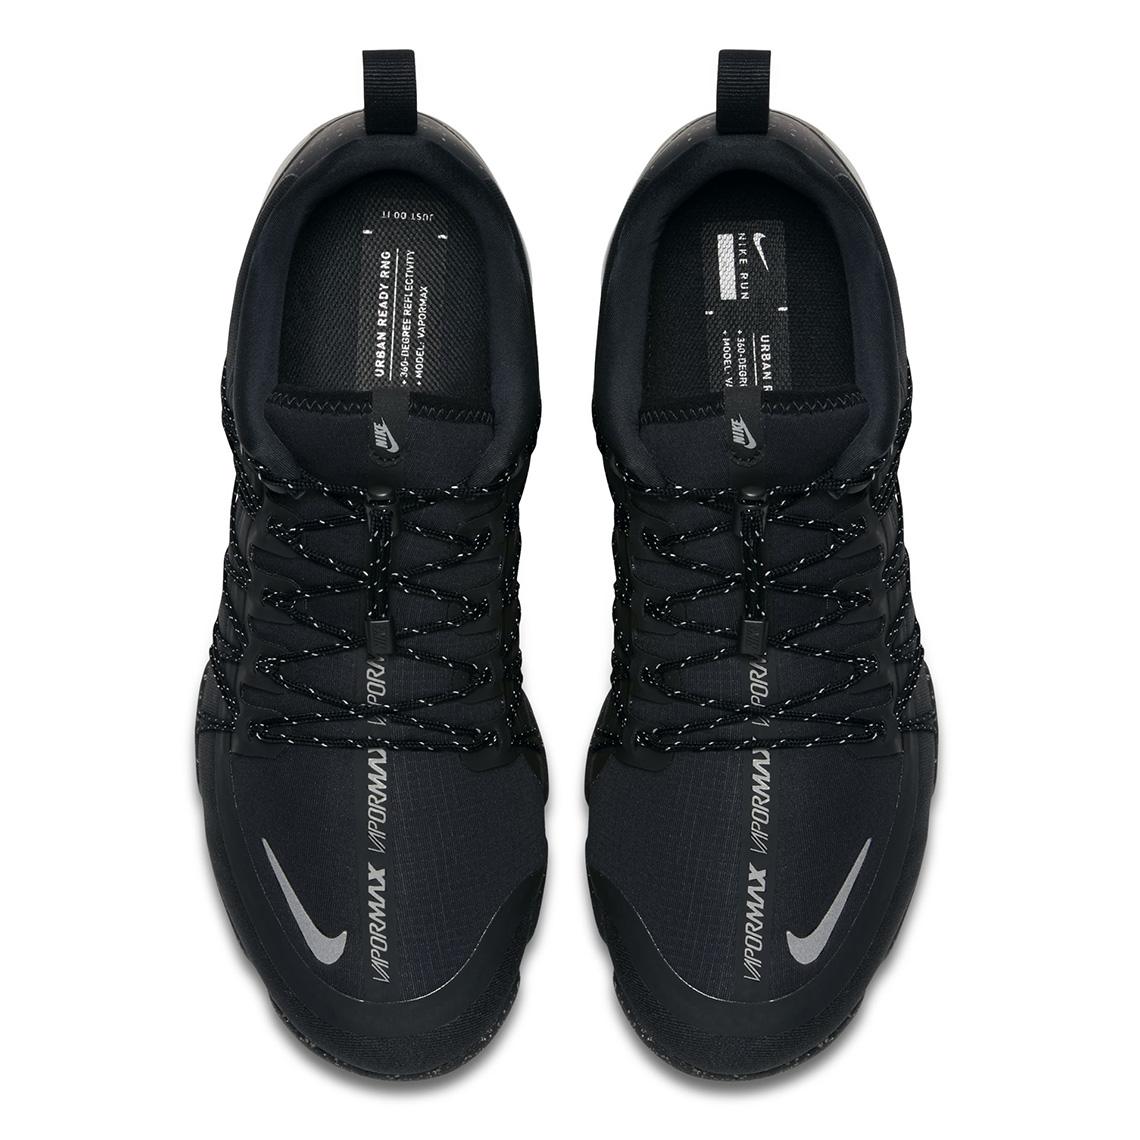 ... Nike Vapormax Run Utility. Foot Locker Available  Eastbay Available   Finish Line Available 8d5de8fe2